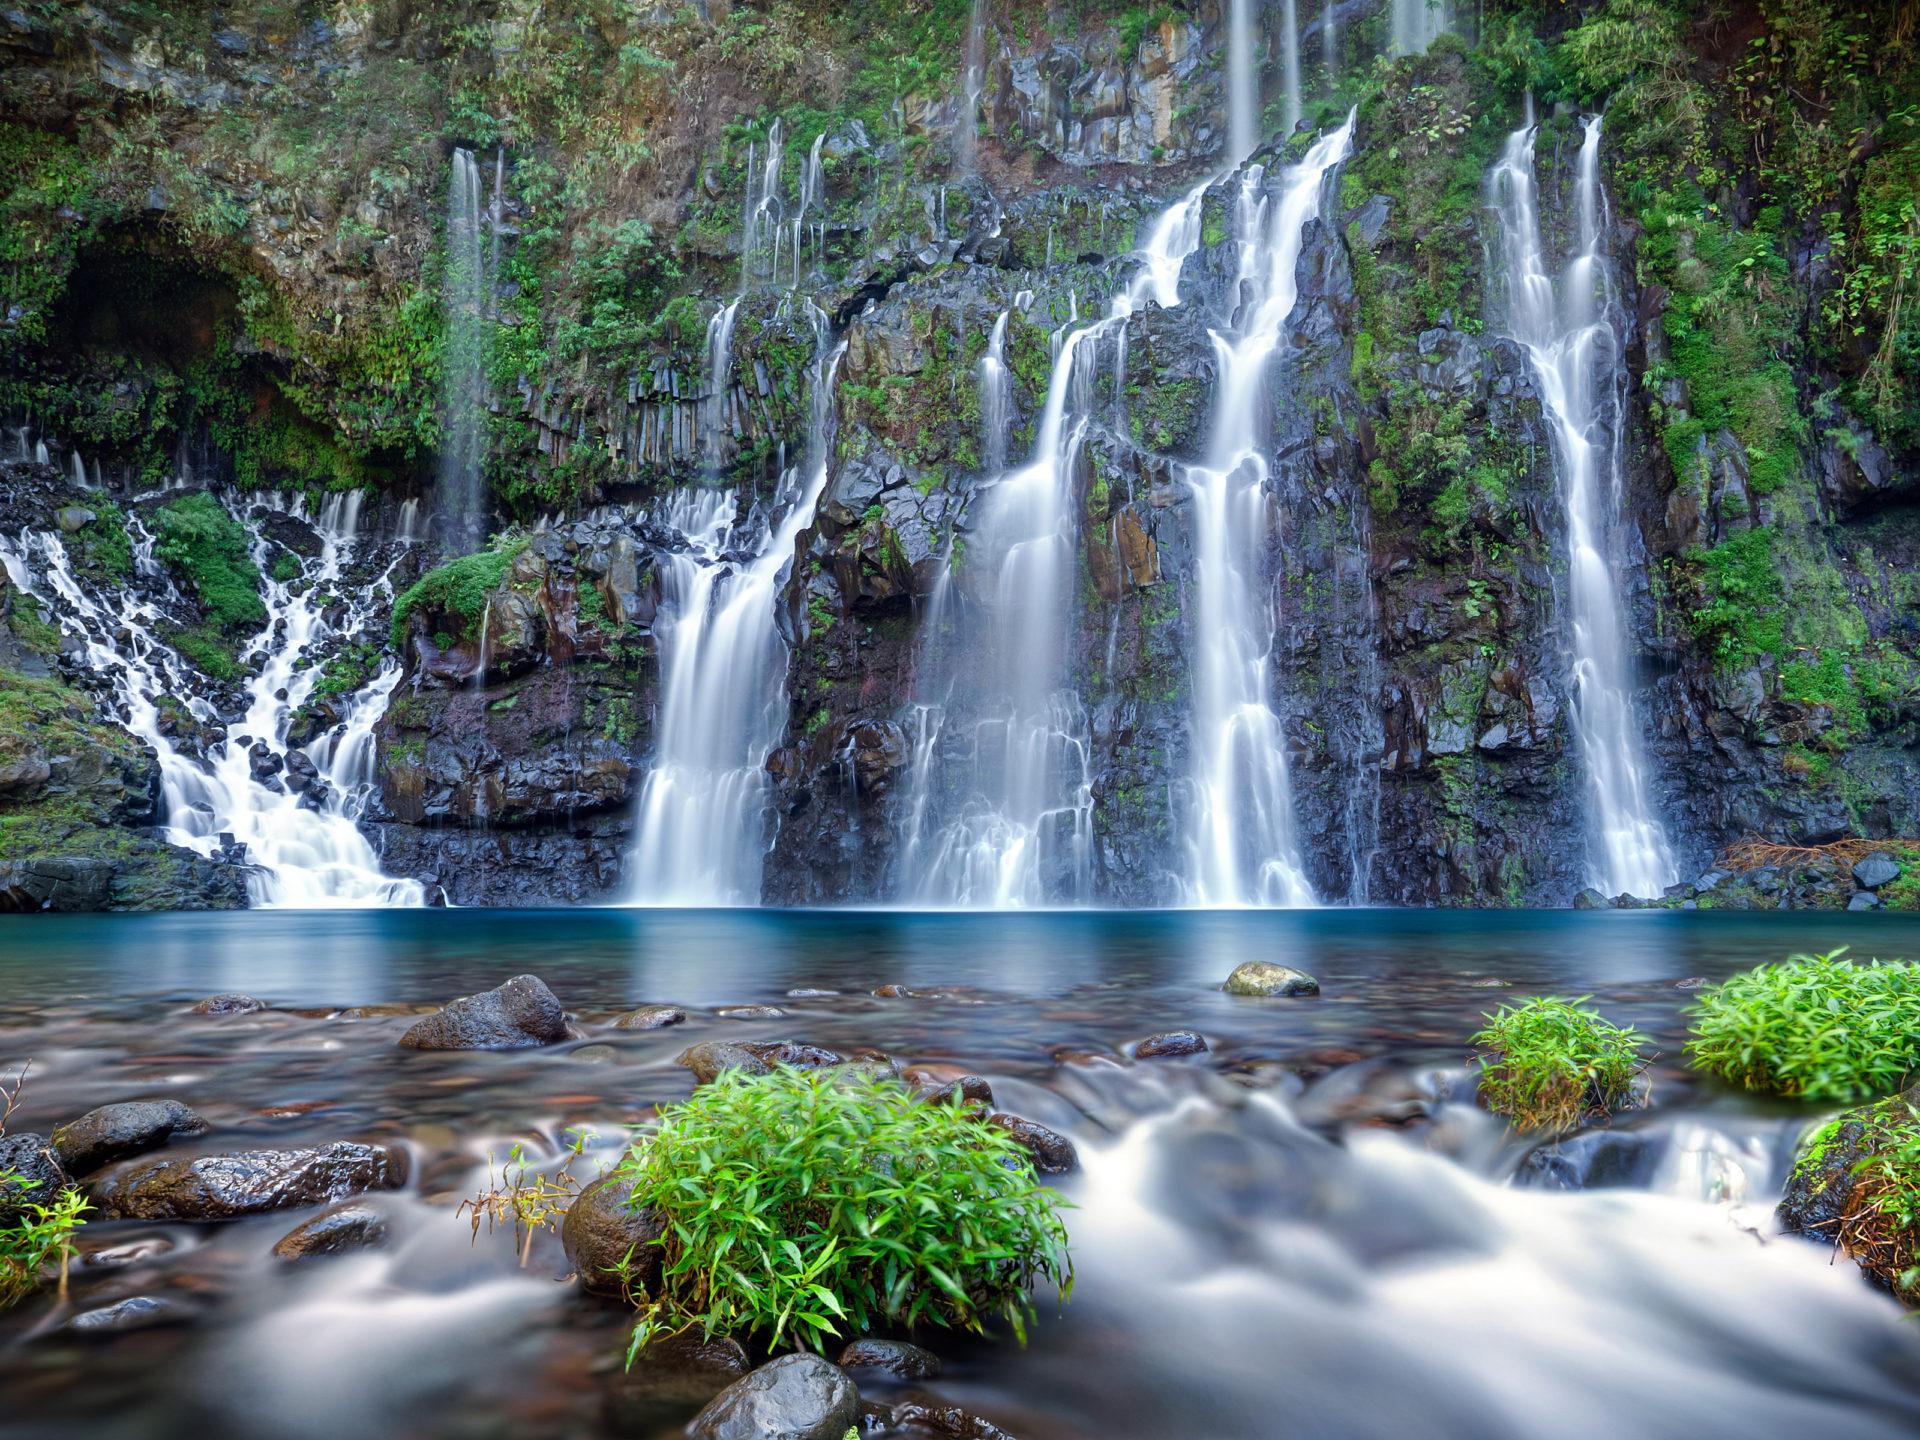 Waterfalls Desktop Wallpaper Forest Falls Langer River Falls Lakes Reunion Island Famous For Its